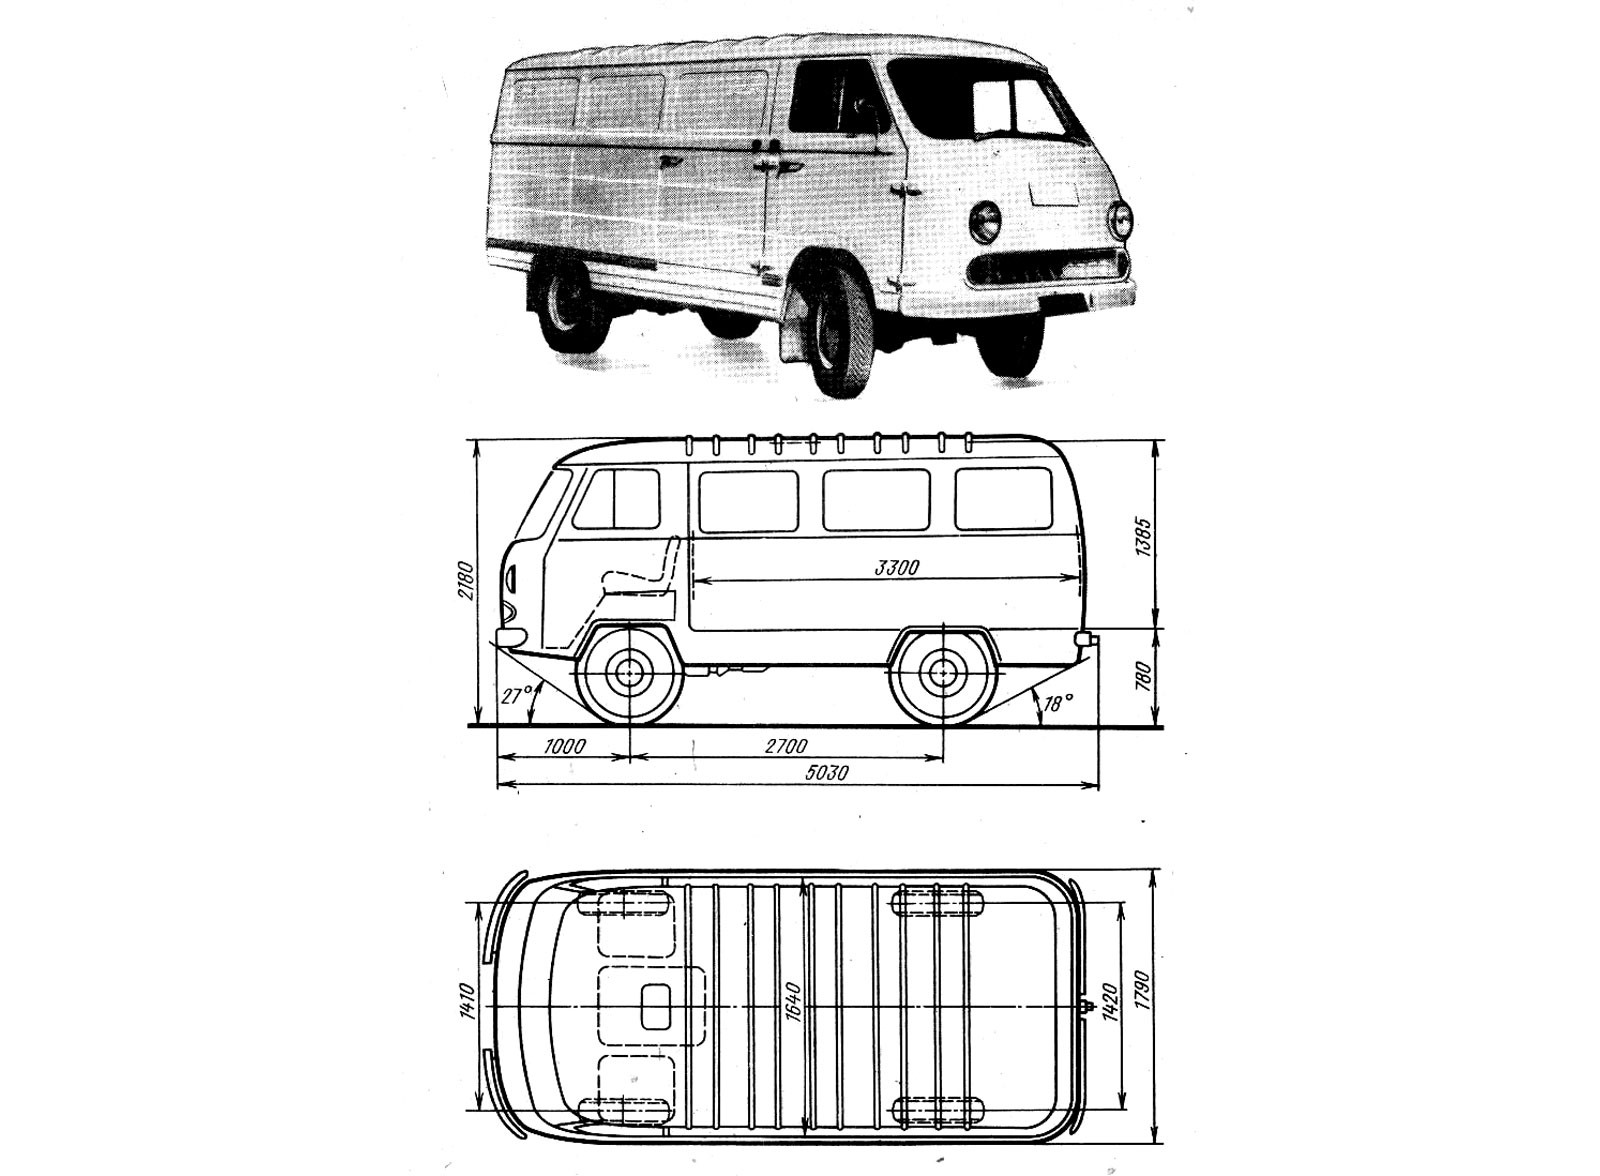 По габаритам фургон повторял микроавтобус РАФ-977